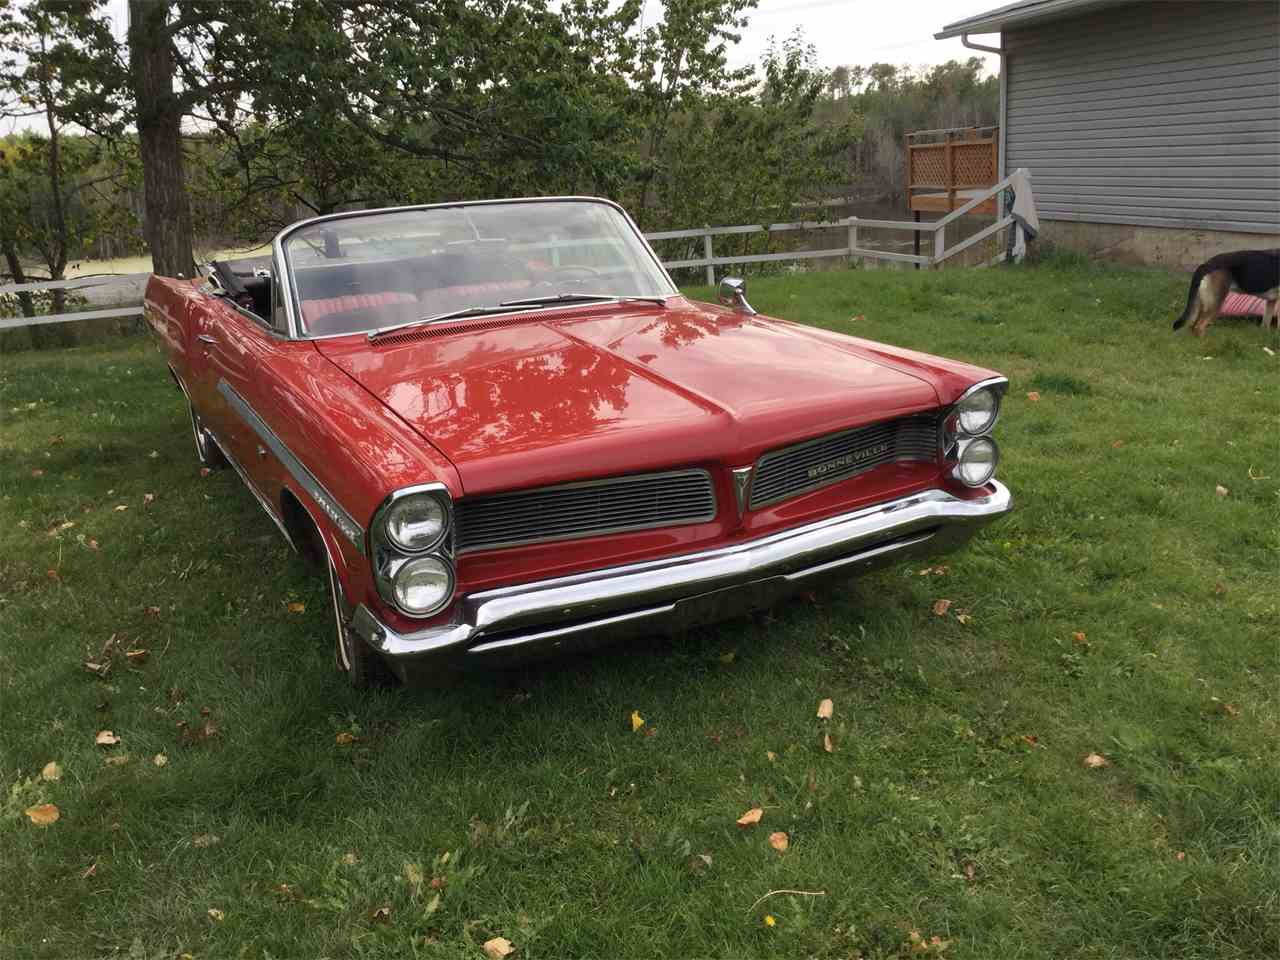 Edmonton Alberta Used Vehicles Cars Trucks Suvs For Sale: 1963 Pontiac Bonneville For Sale